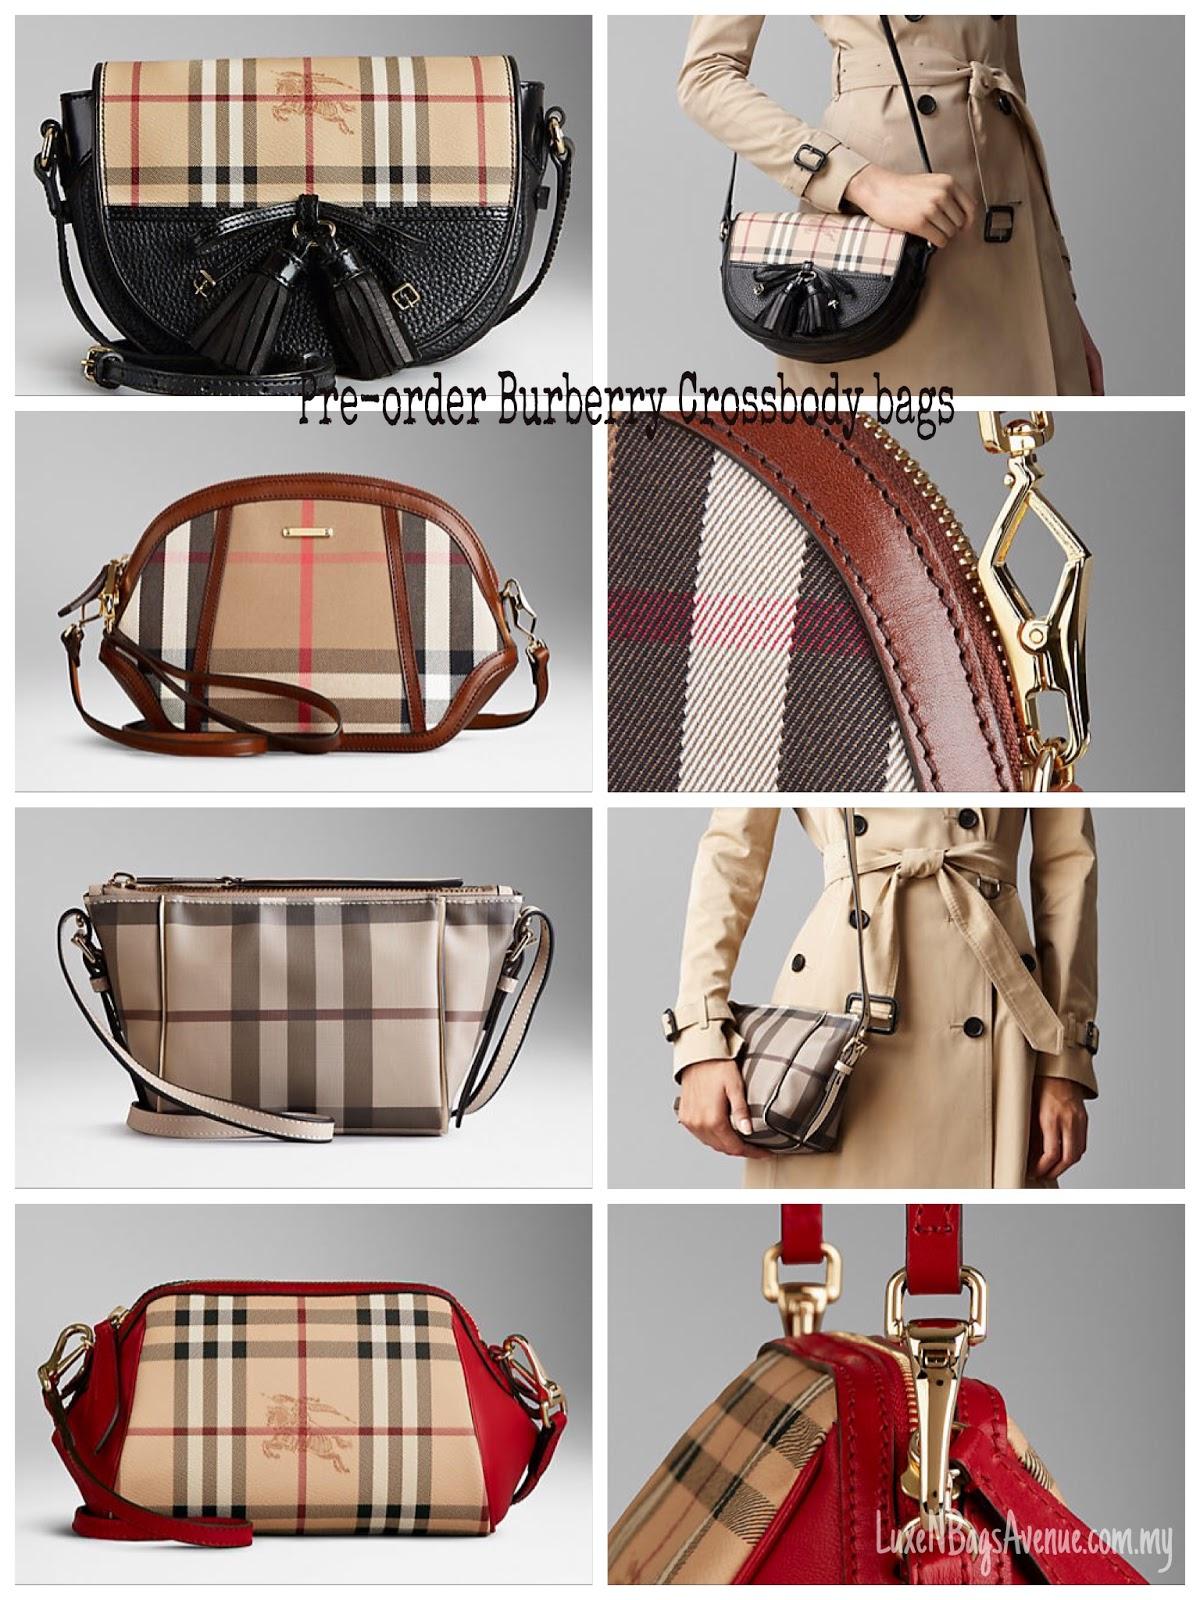 73ce688f97 LuxeNBagsAvenue.com.my: HARI RAYA Pre-order Promotion for Burberry ...